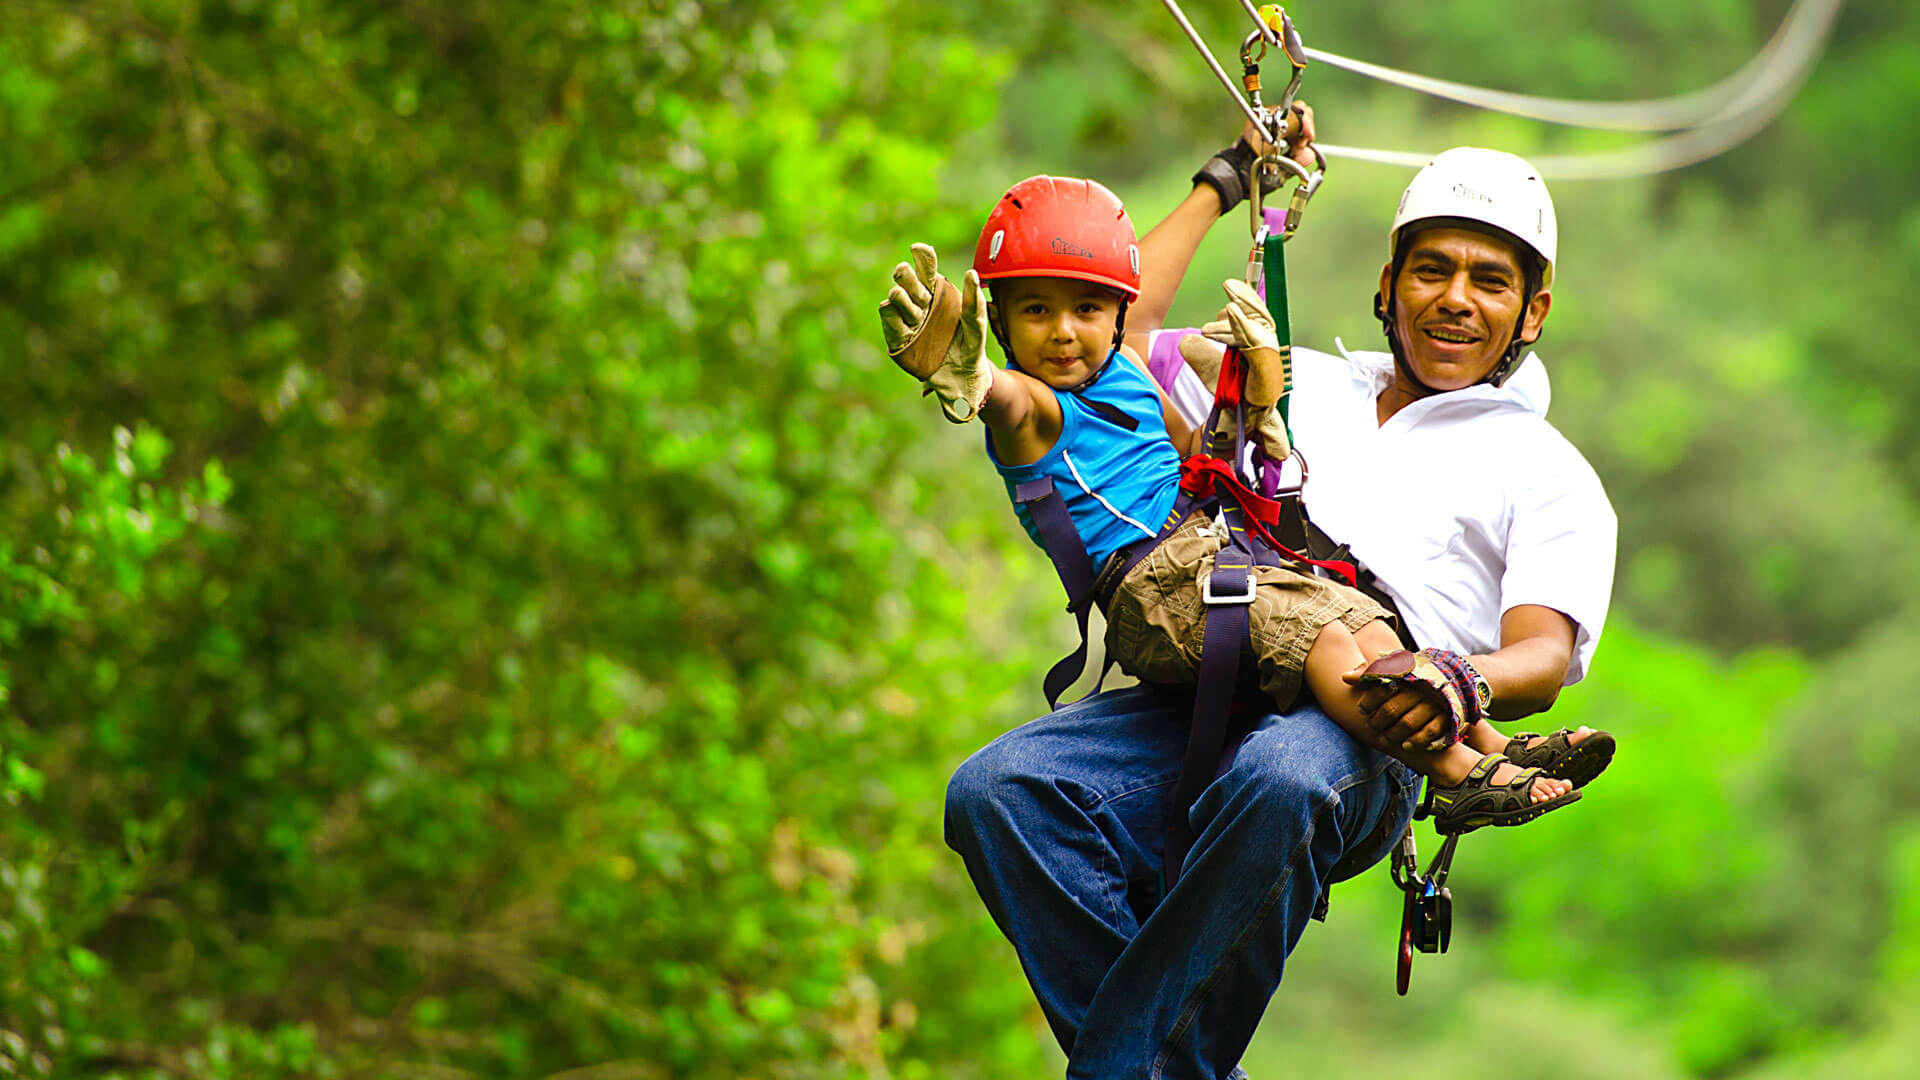 Costa Rica ziplining family adventure Dad and waving son on tandem zipline